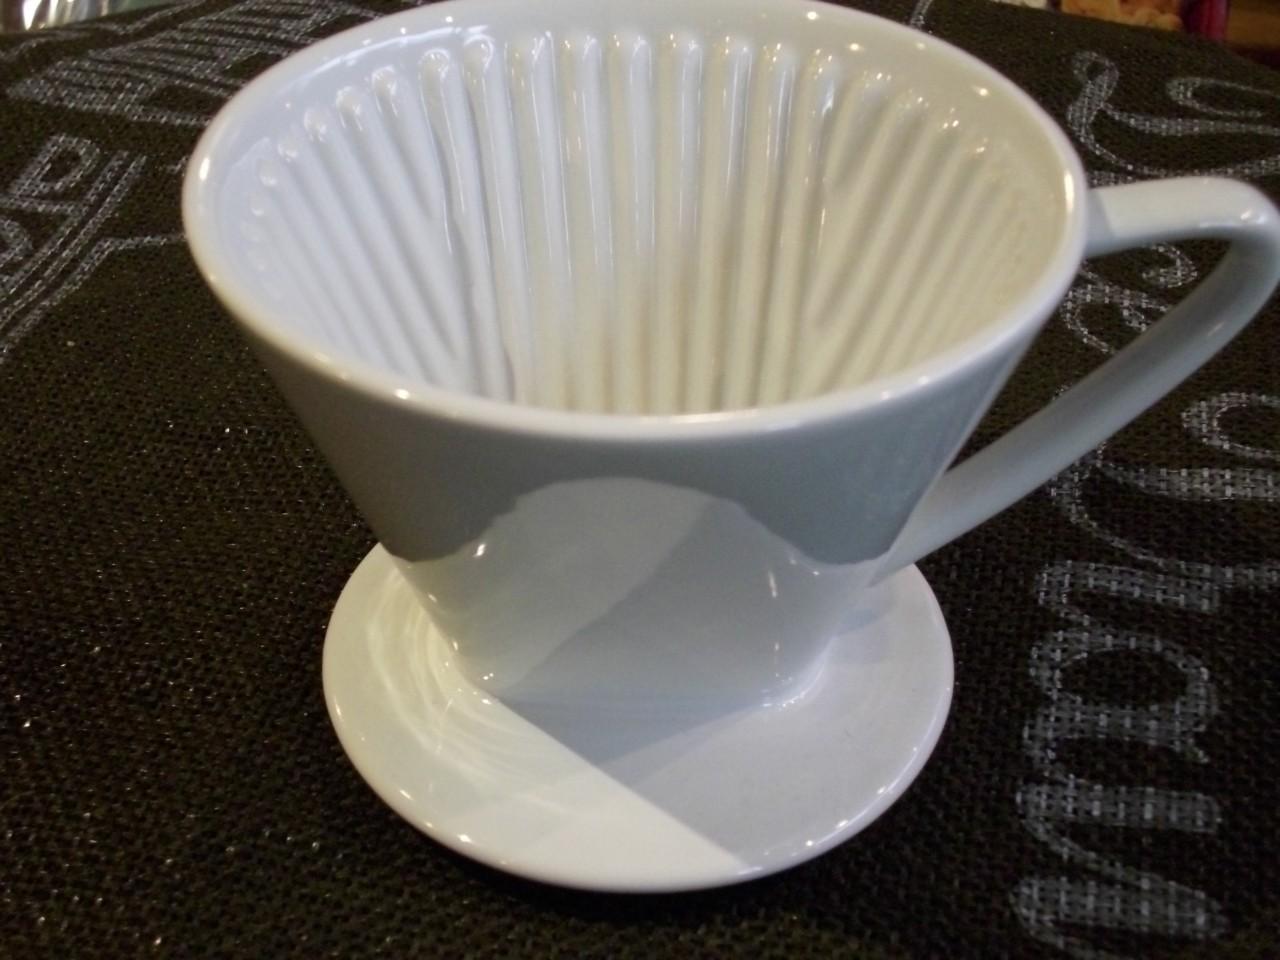 Kaffee-Porzellan-Filter NR.4